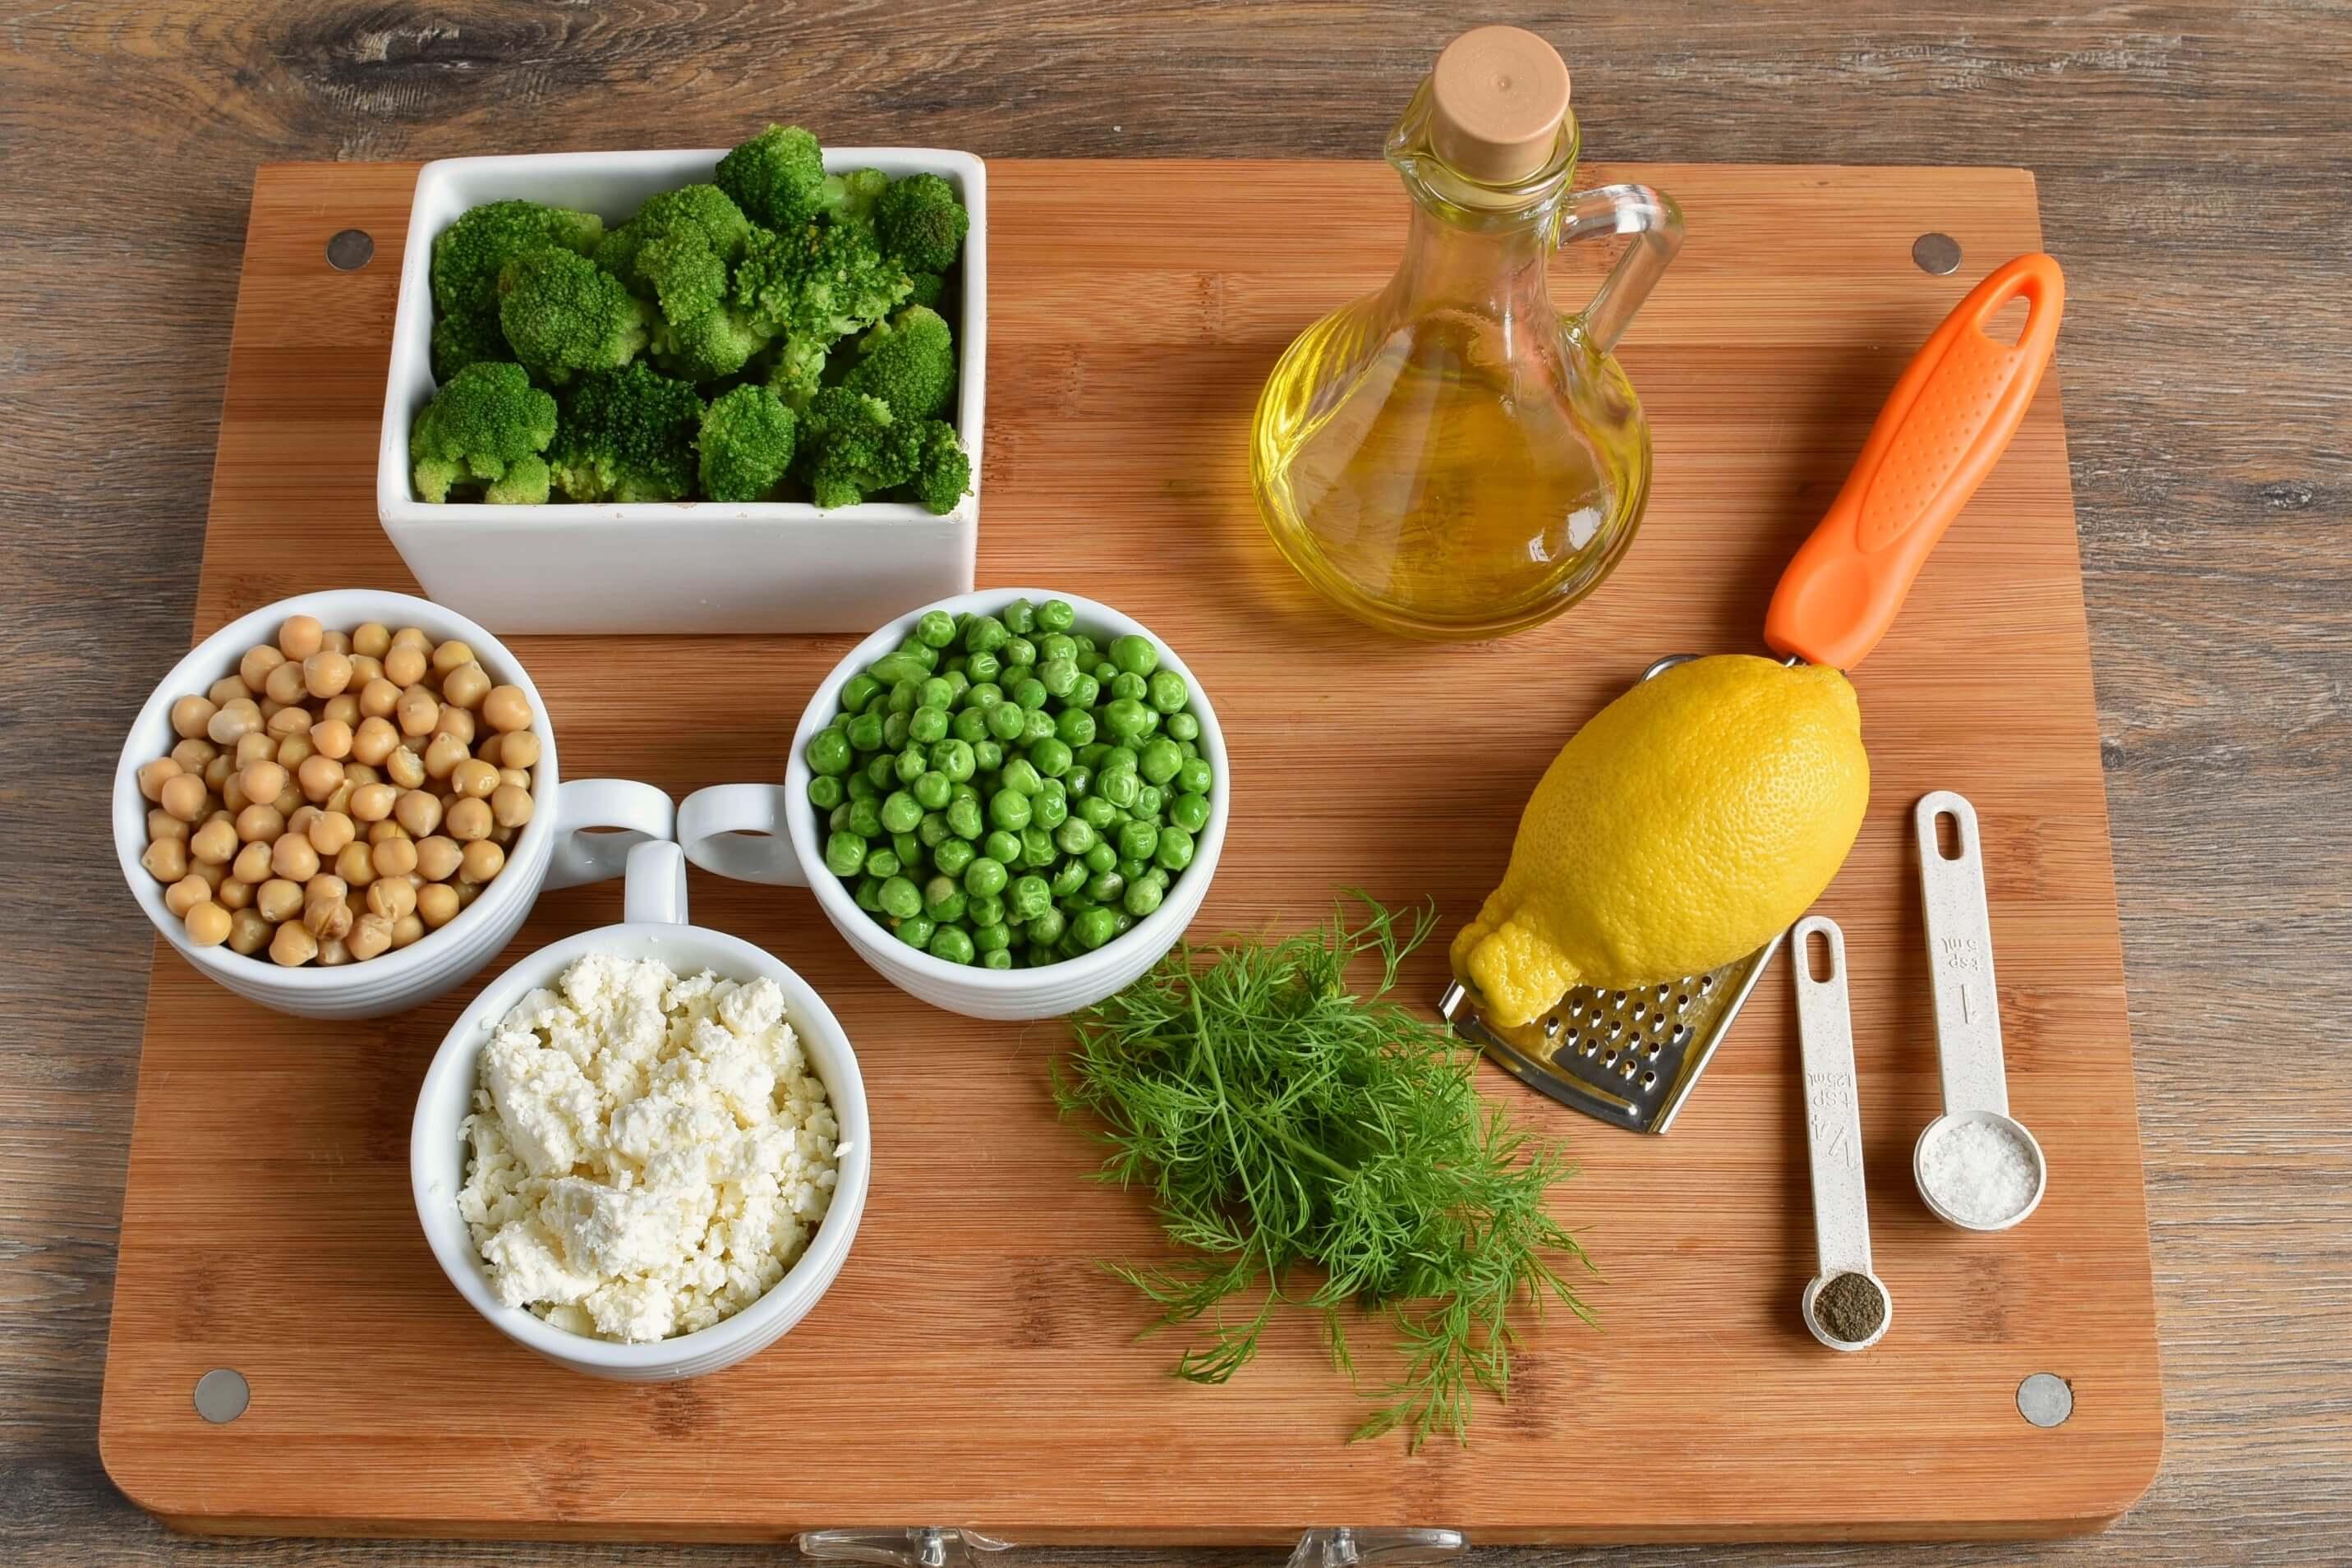 Ingridiens for Lemony Broccoli Salad With Chickpeas and Feta